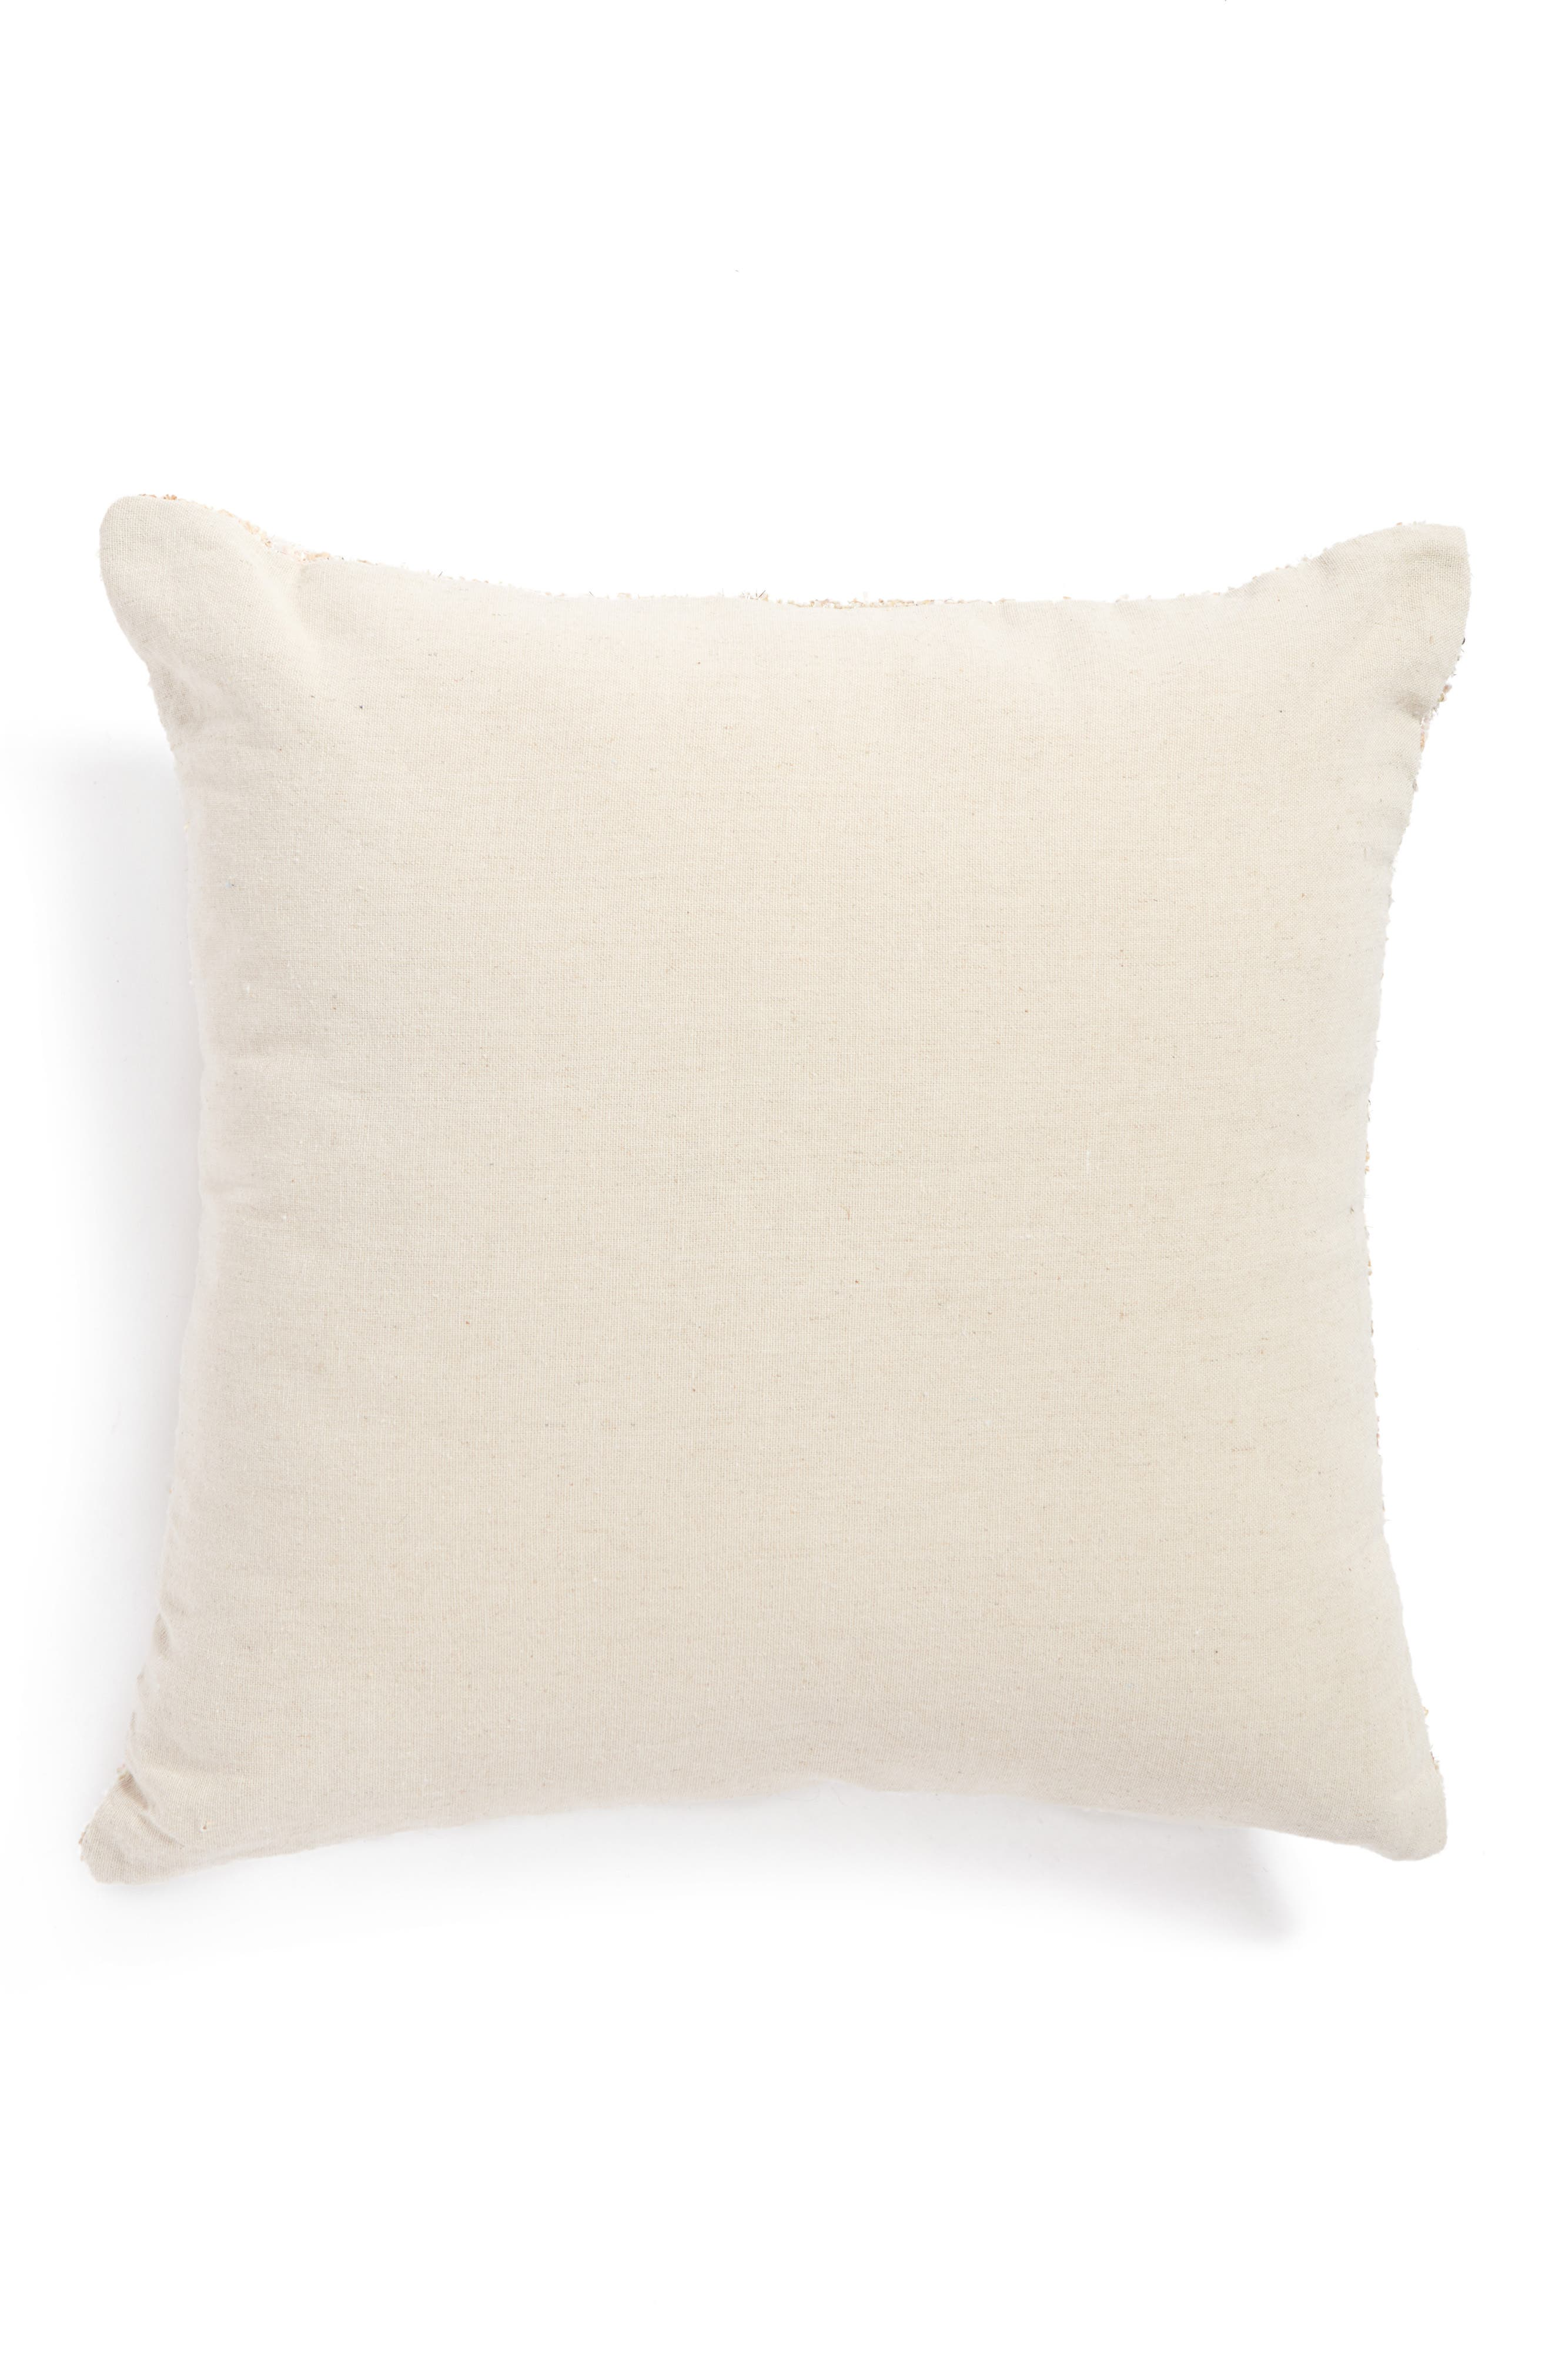 Metallic Accent Pillow,                             Alternate thumbnail 2, color,                             680